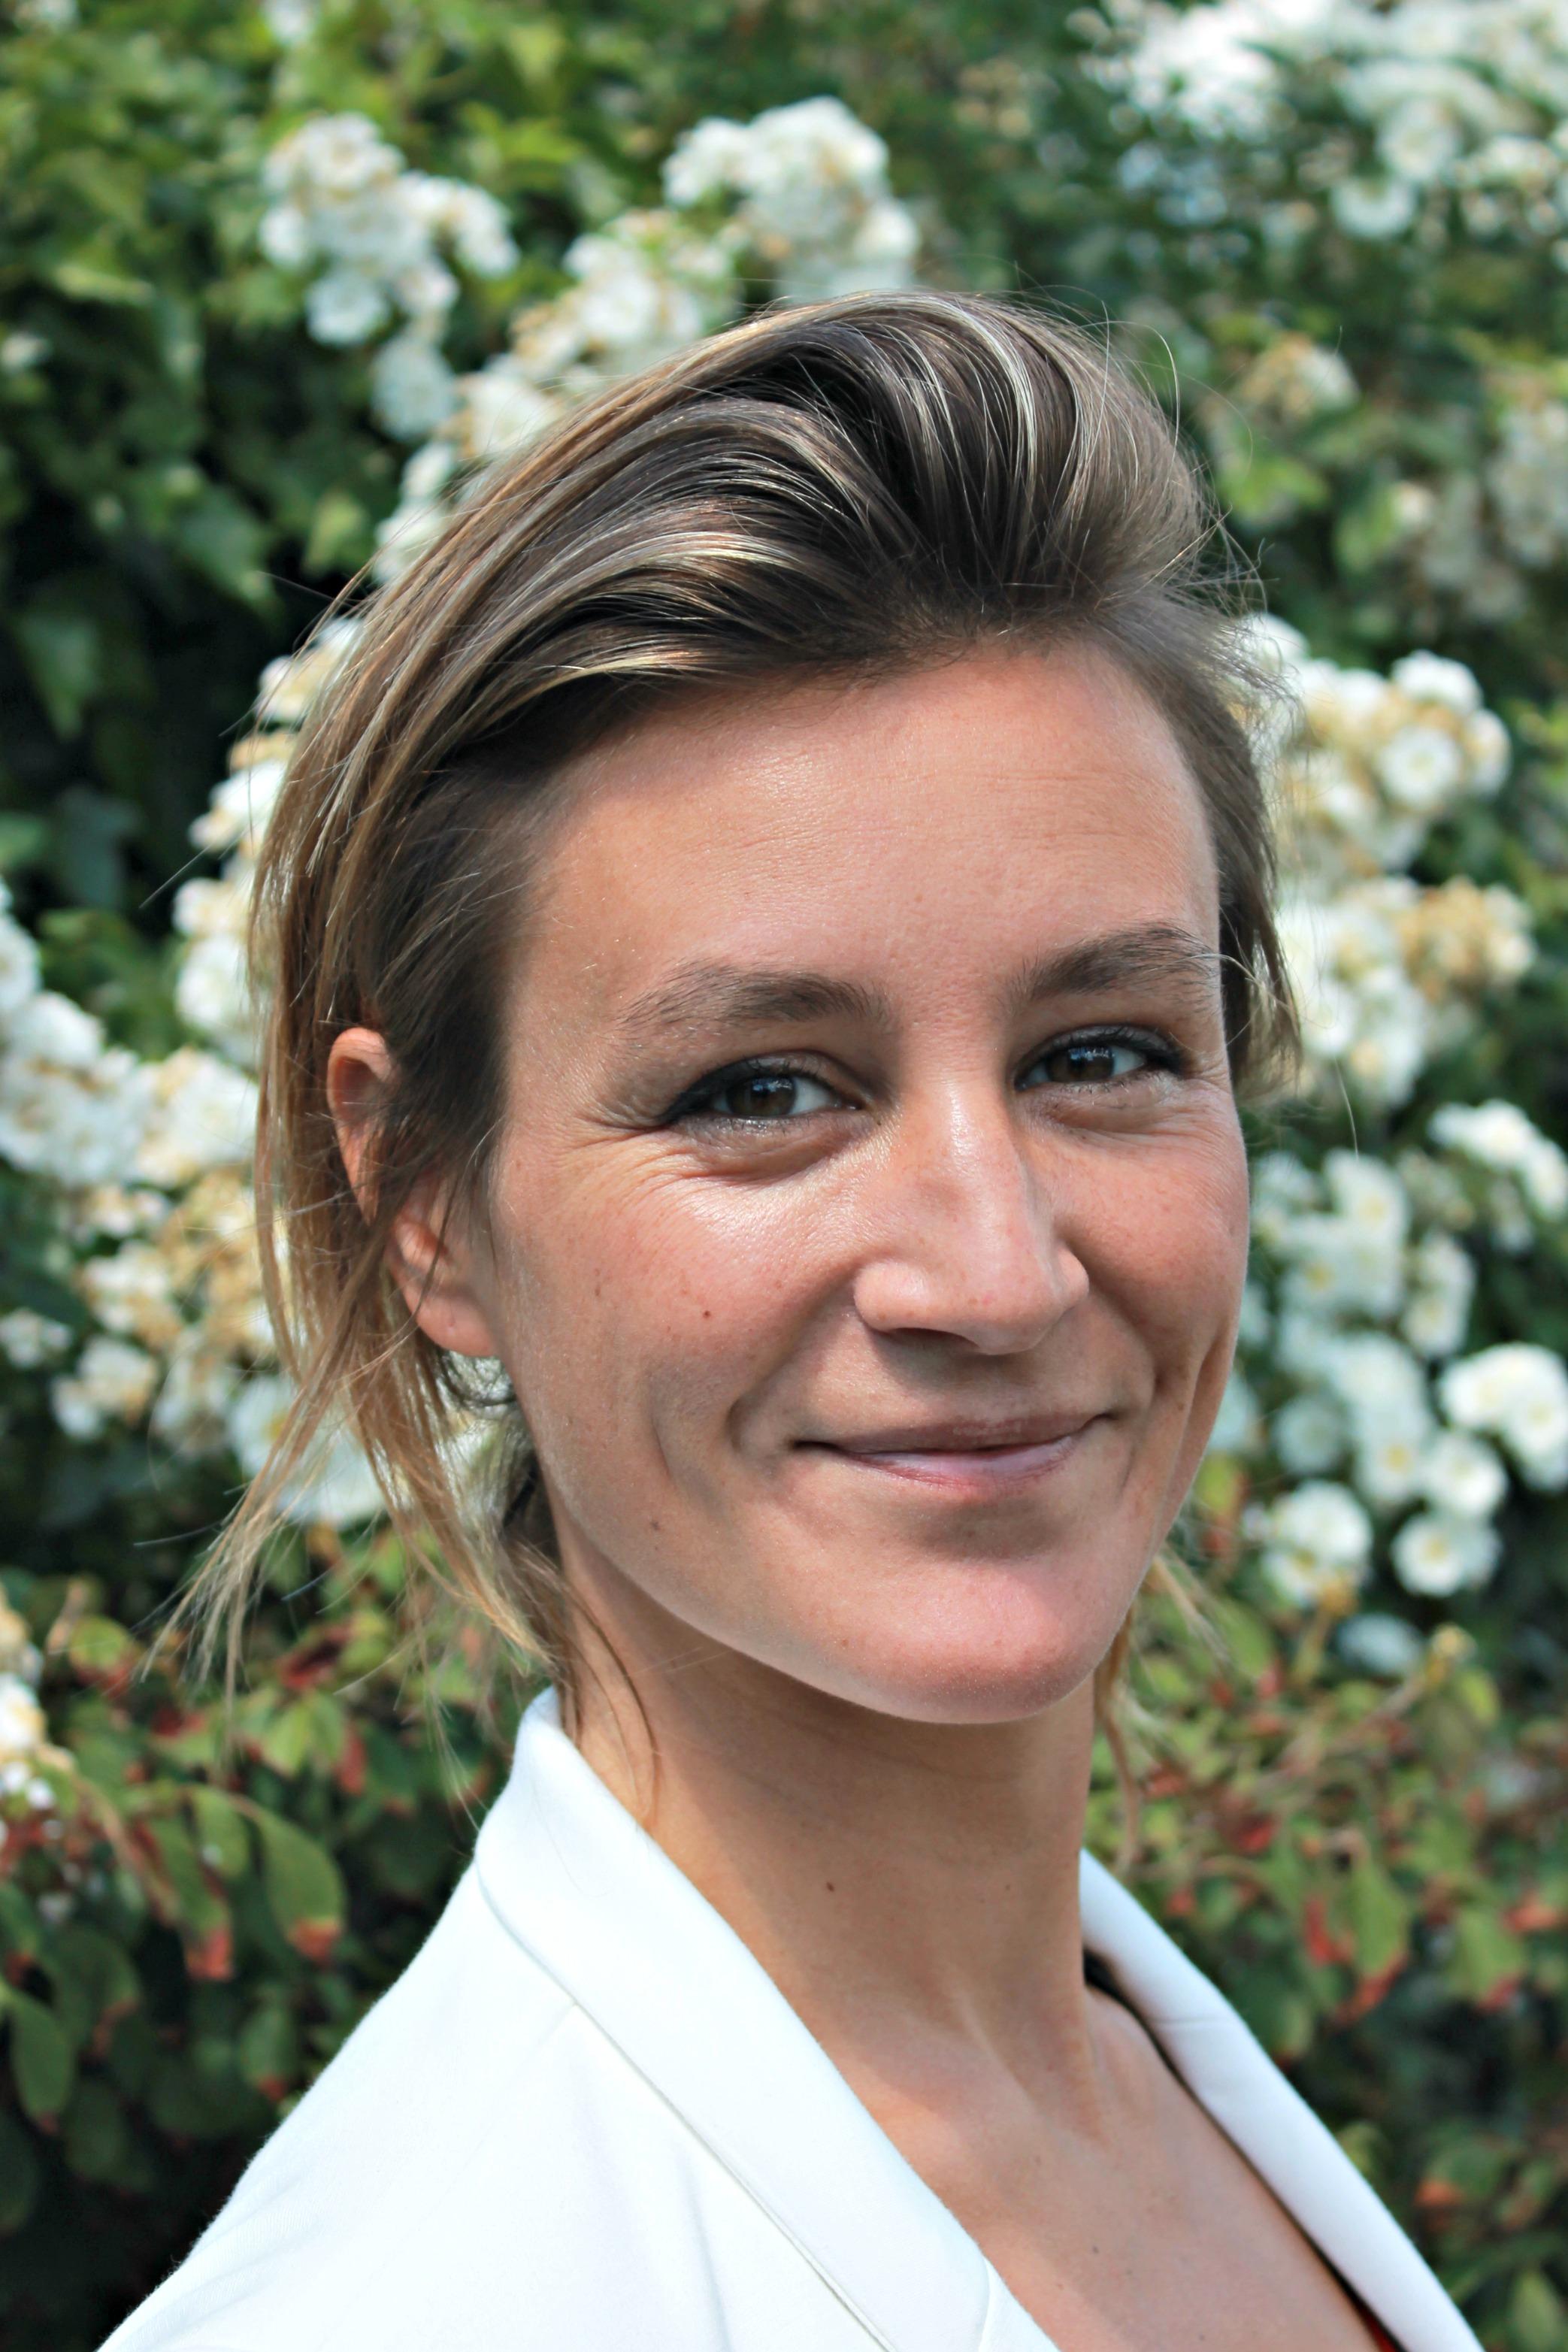 Jessica Scheper